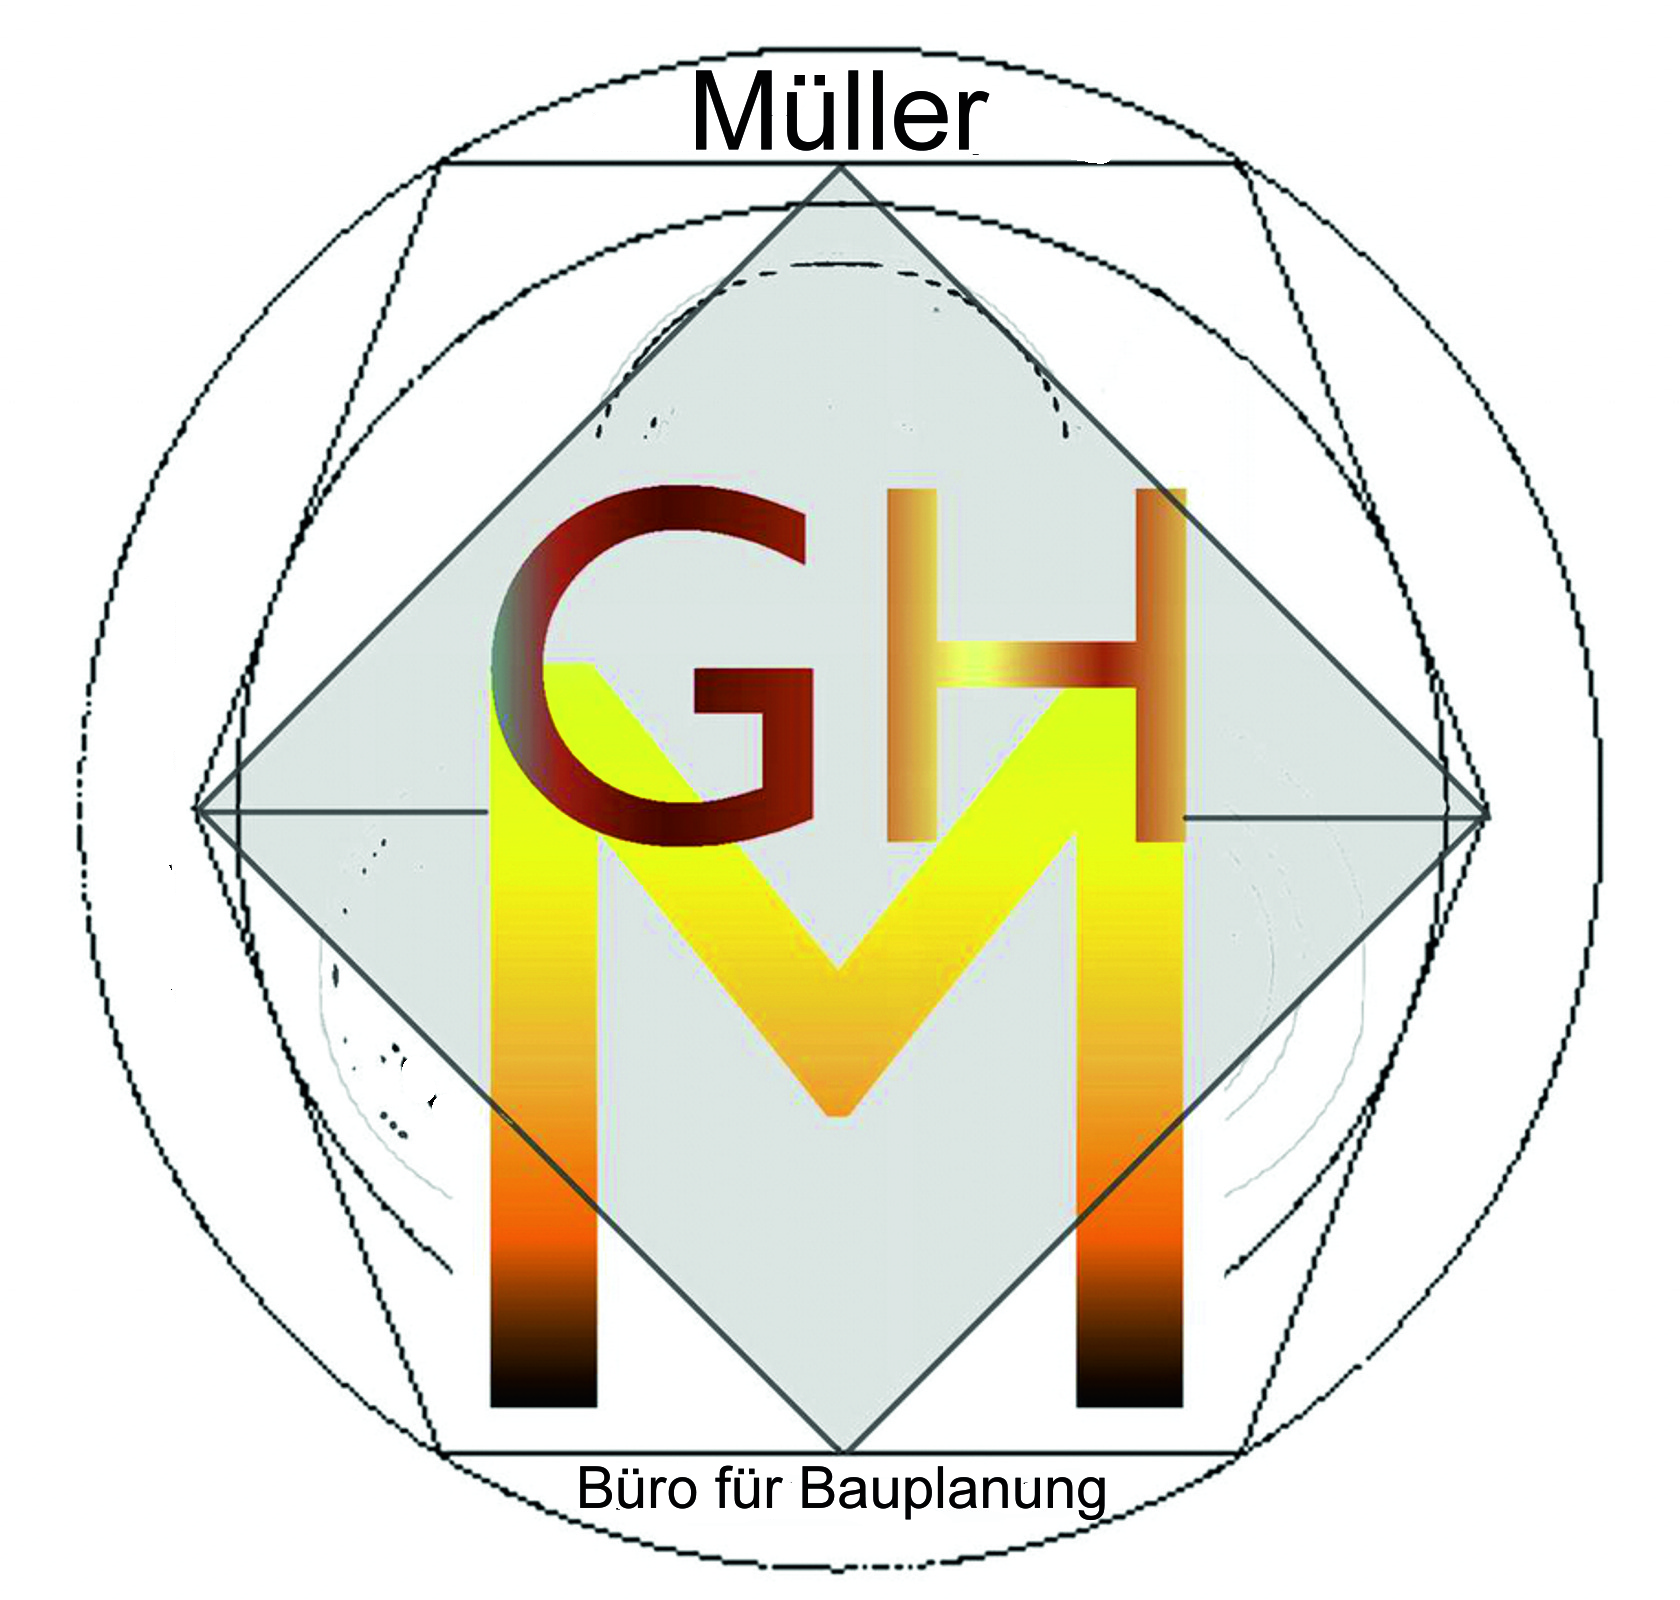 Büro für Bauplanung Dipl. Ing. G. H. Müller